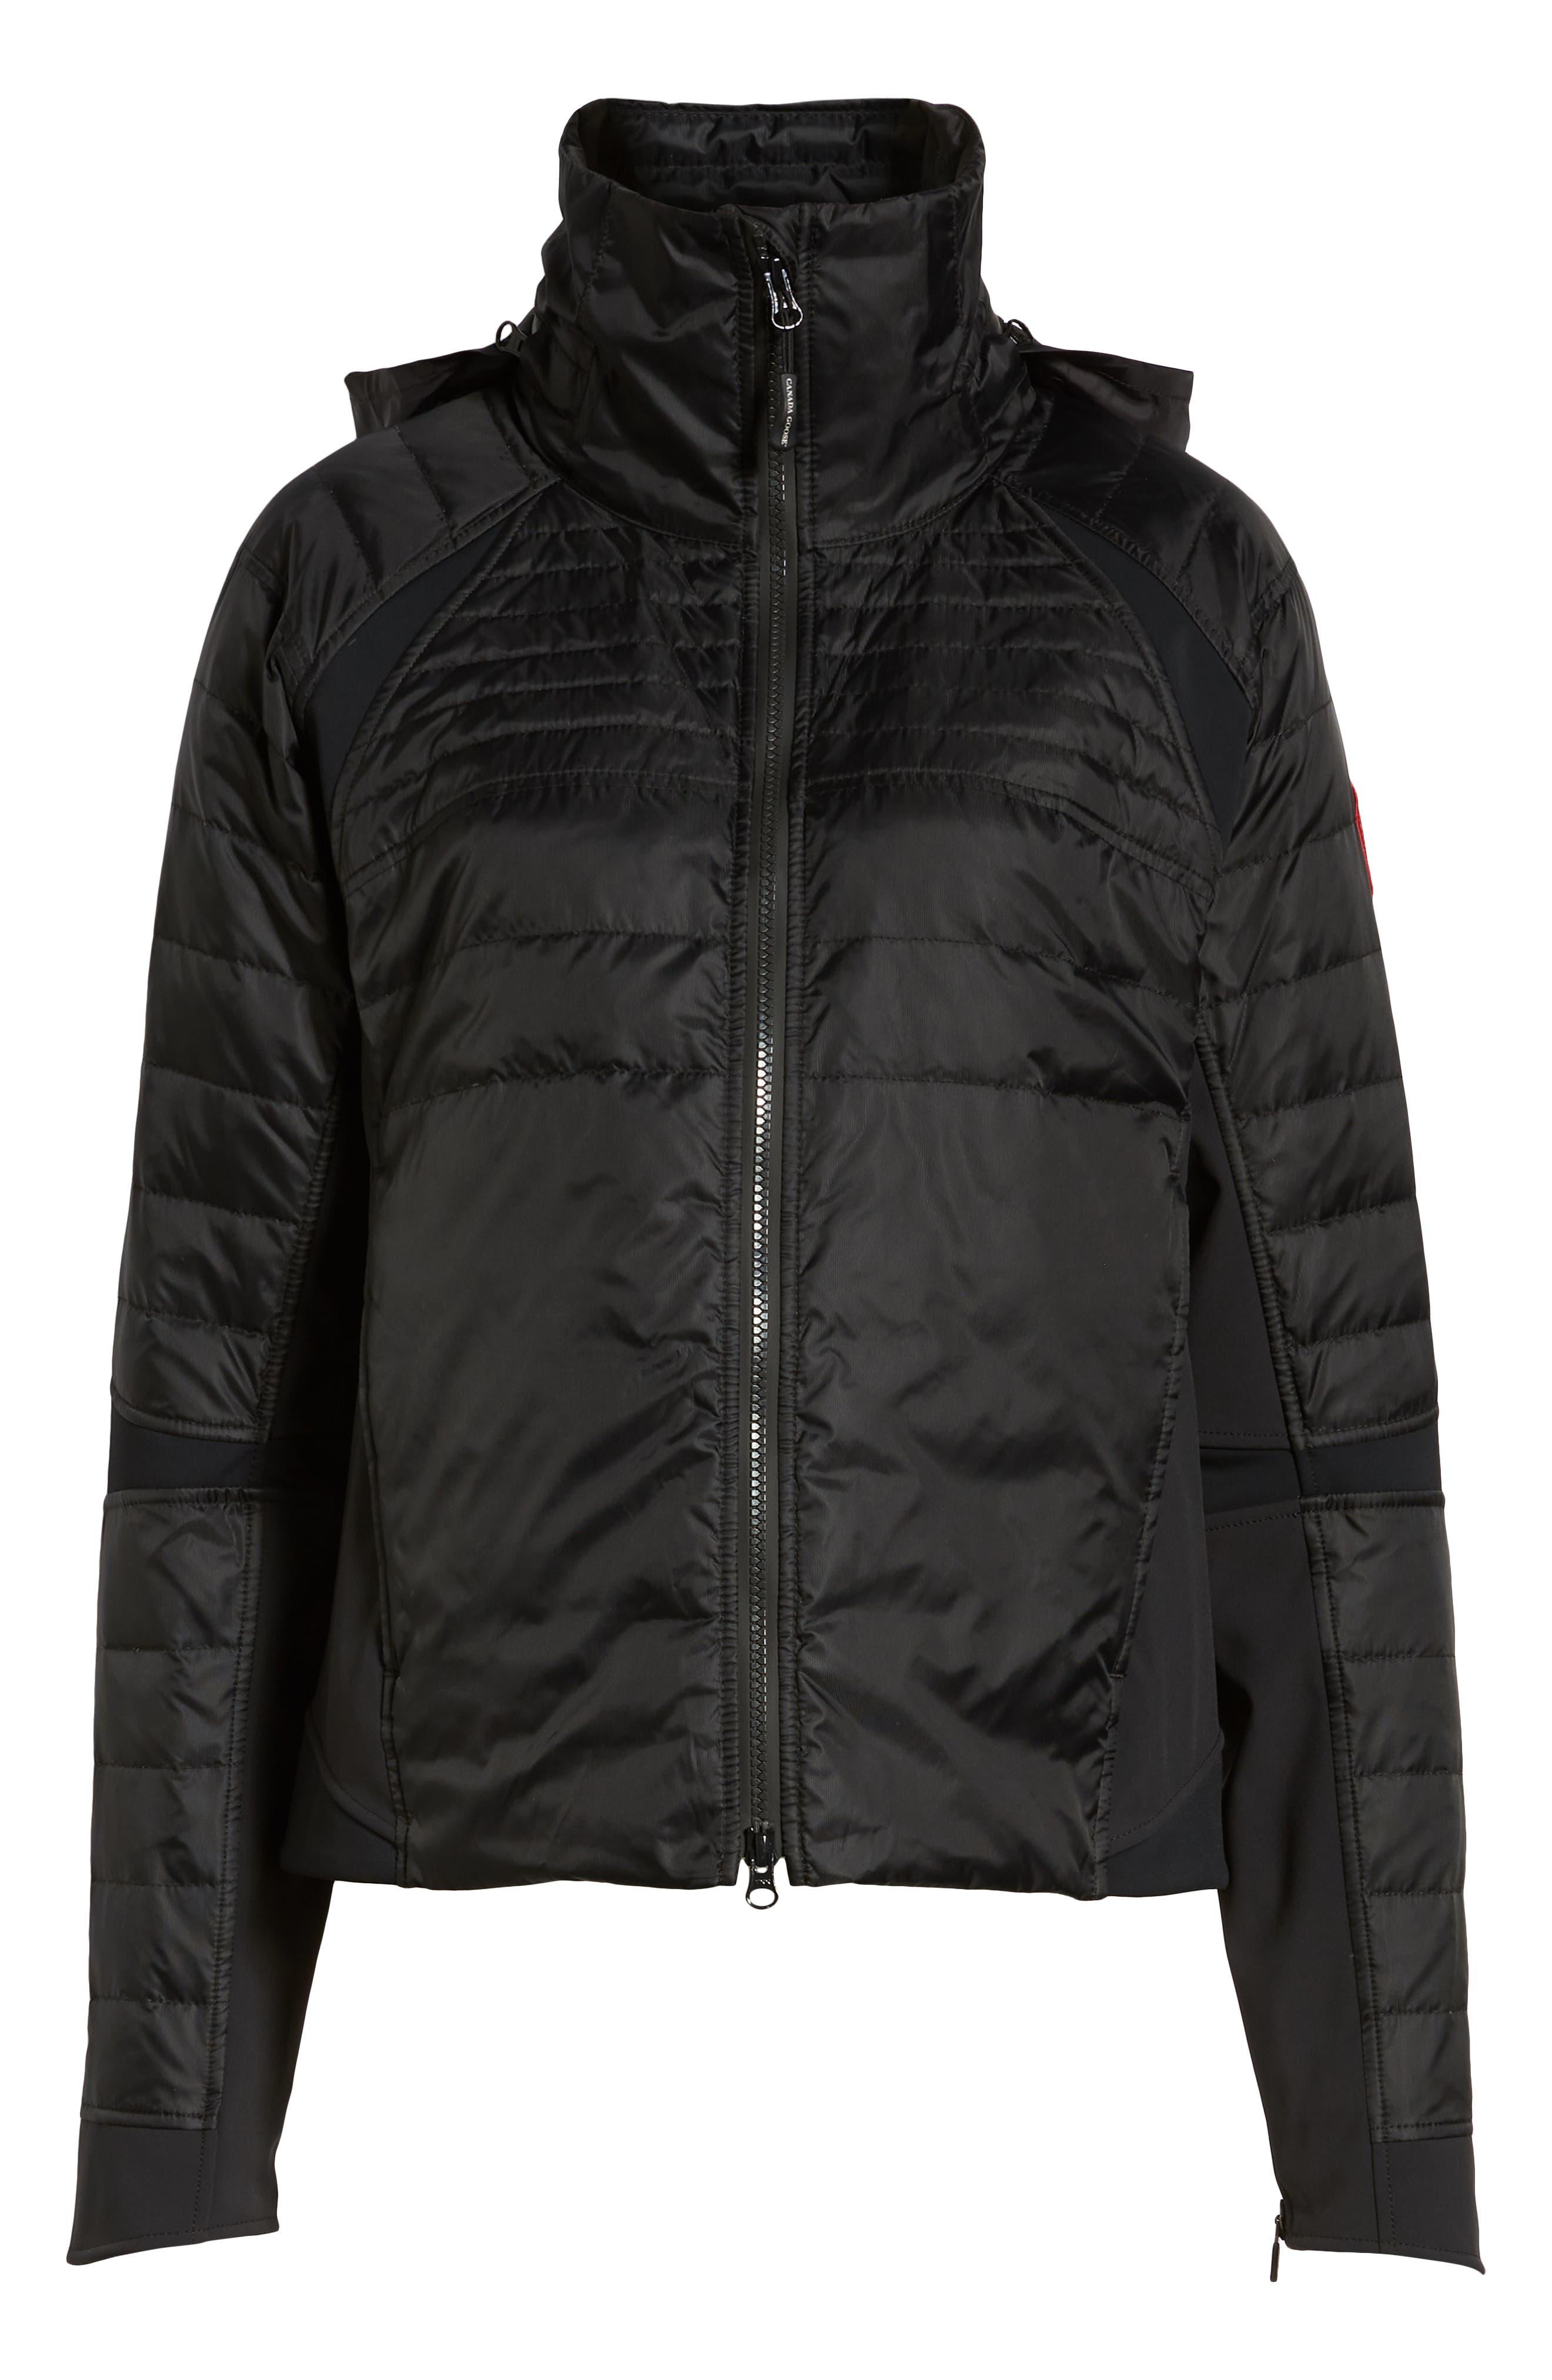 CANADA GOOSE, Hybridge Perren Jacket, Alternate thumbnail 2, color, BLACK